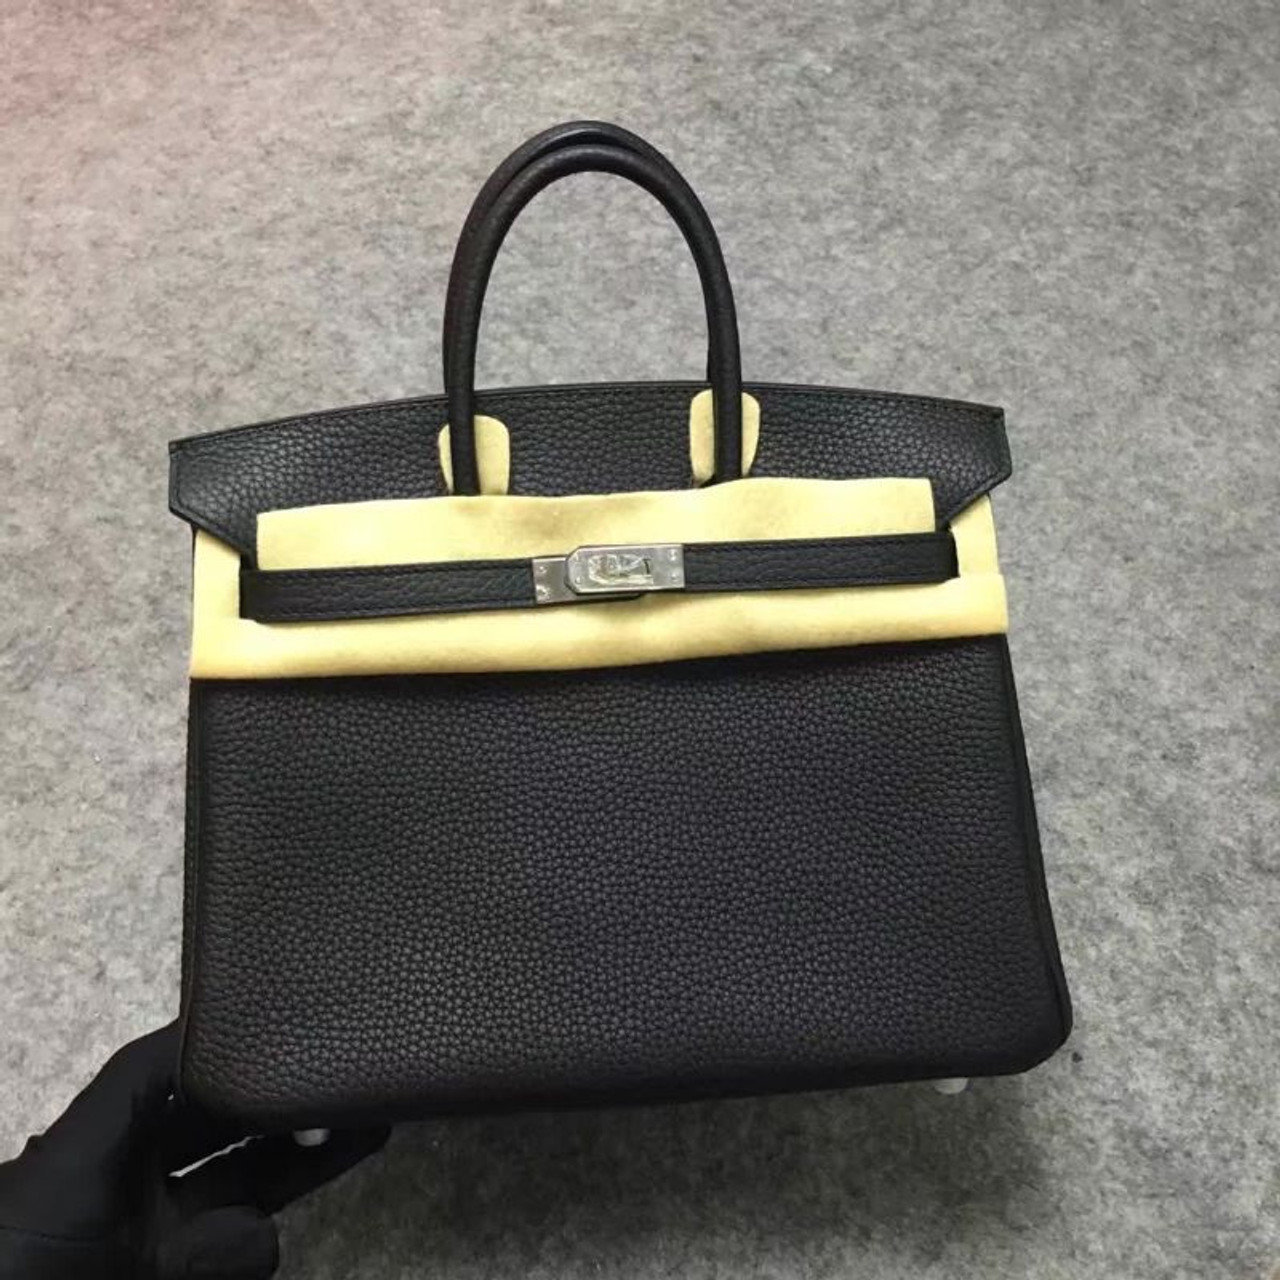 64ee9062b4a7 Hermès Birkin 35 cm Togo Leather Palladium Hardware - Bella Vita Moda